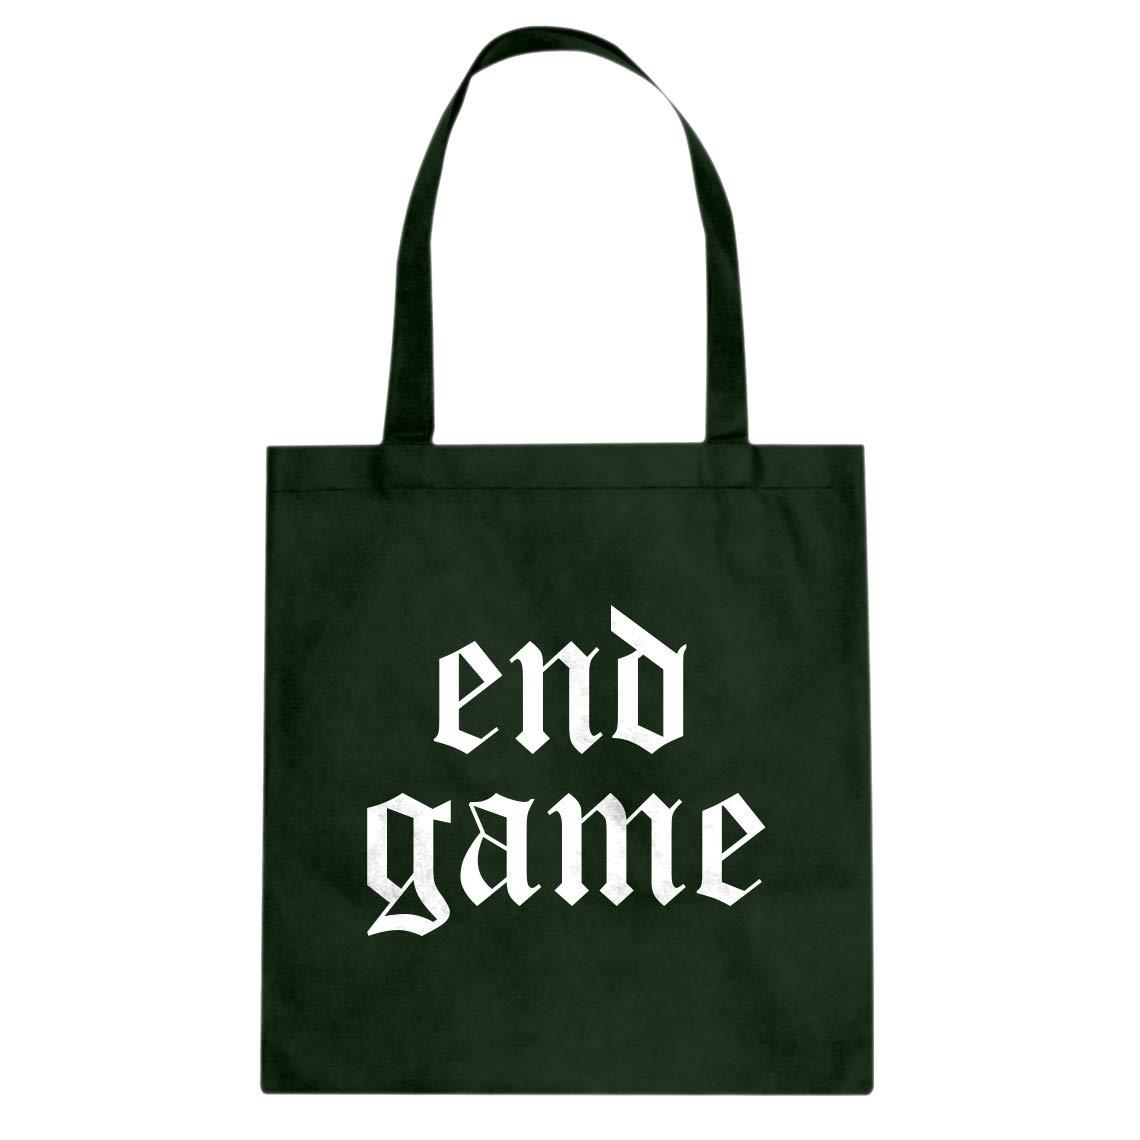 Indica Plateau End Game Cotton Canvas Tote Bag